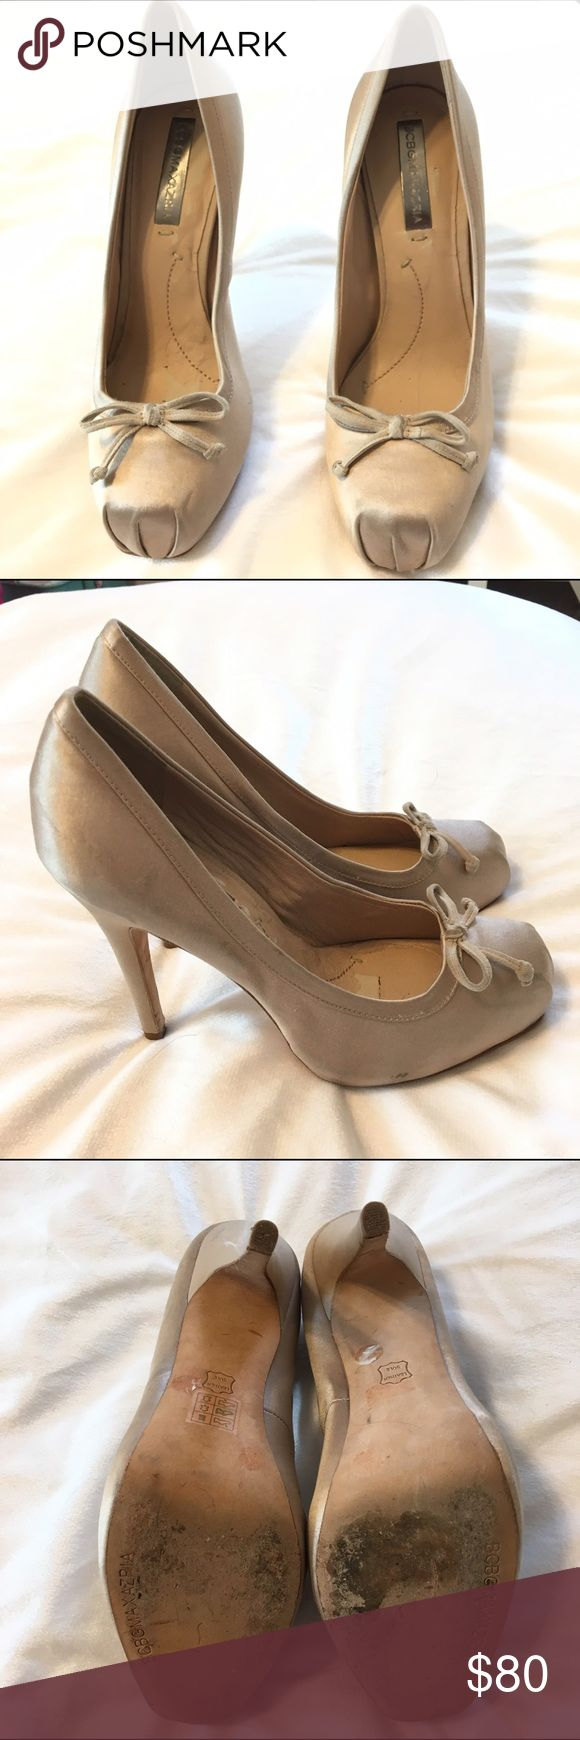 25 best ideas about ballet heels on